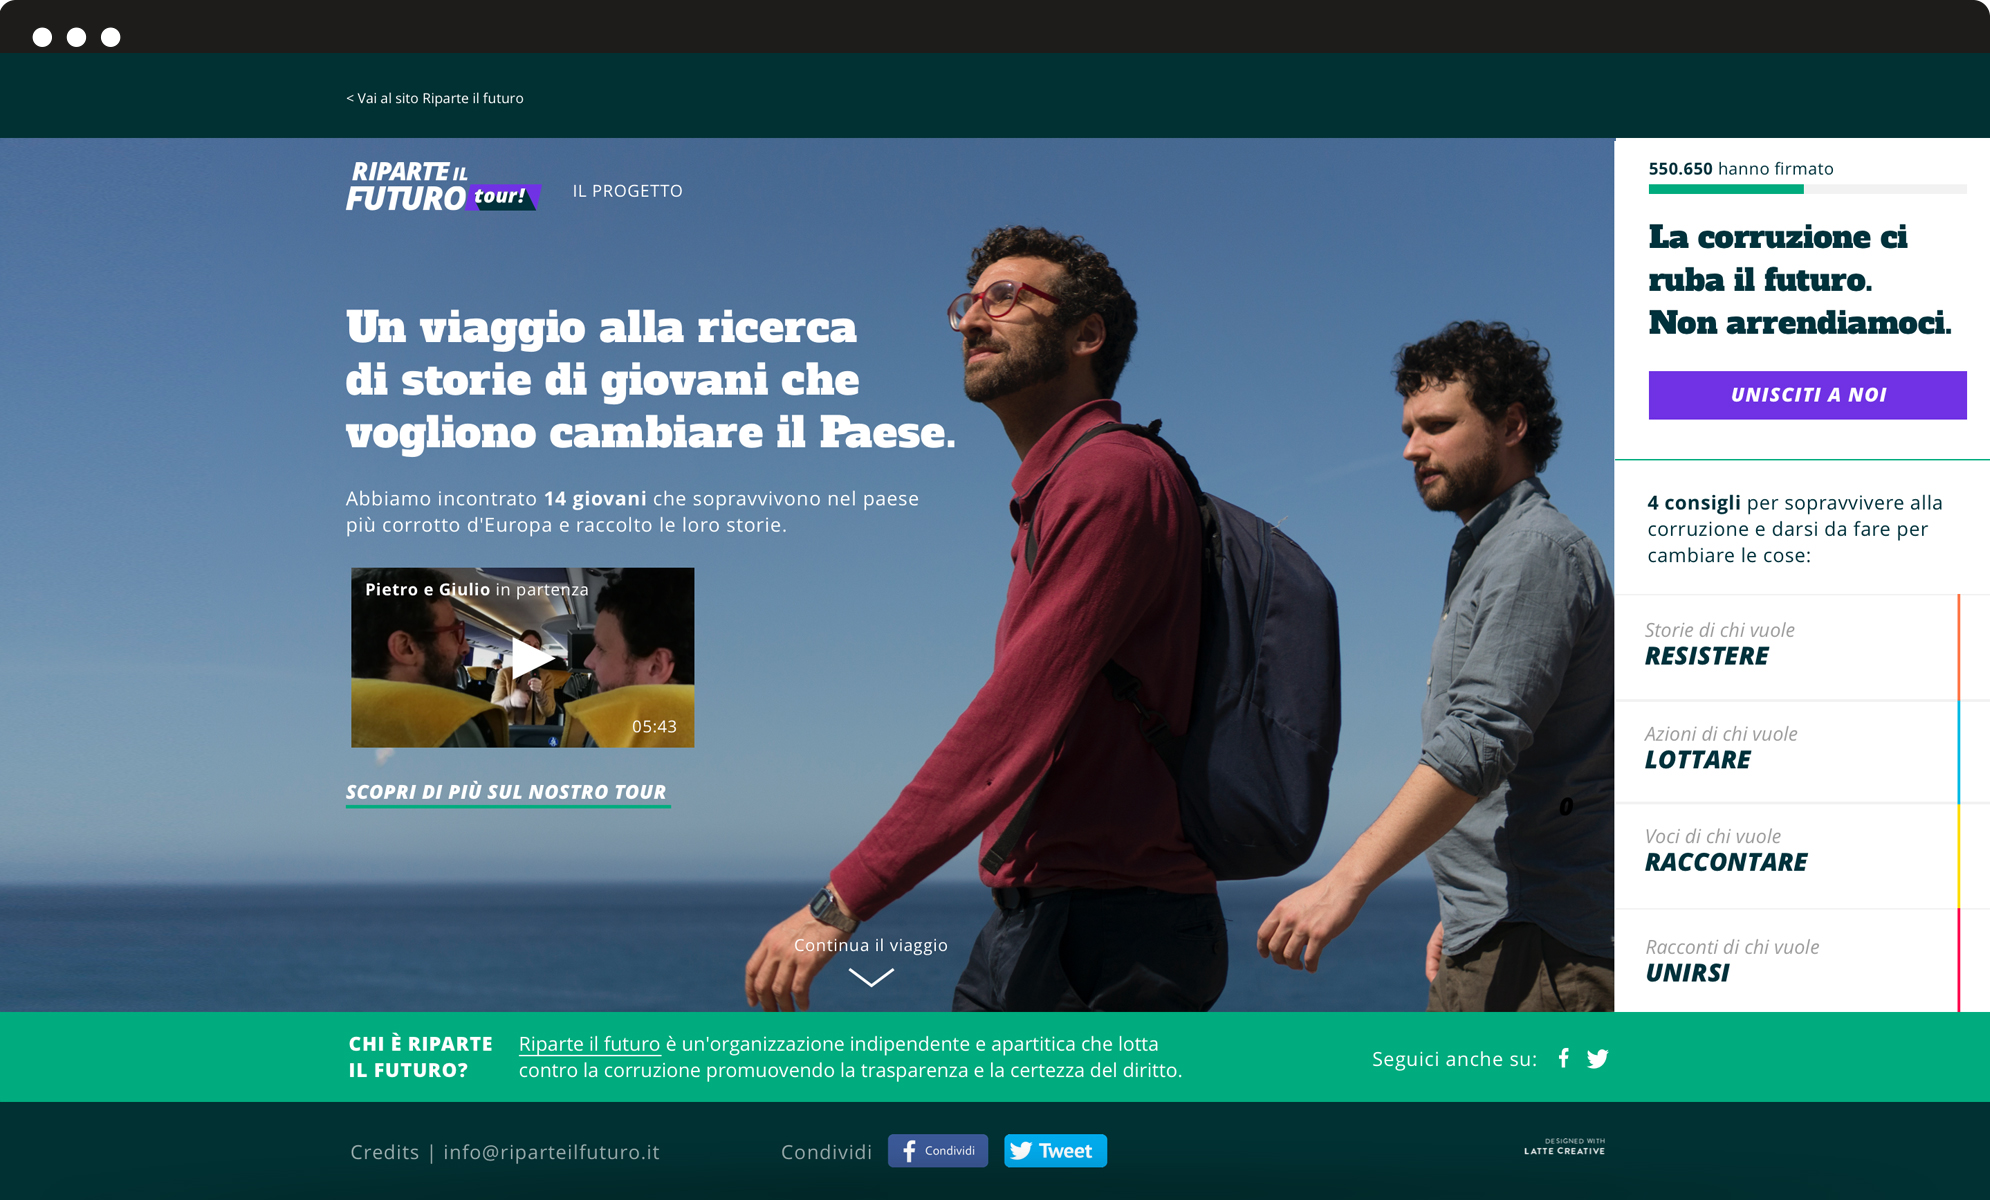 image of the website of riparte il futuro tour